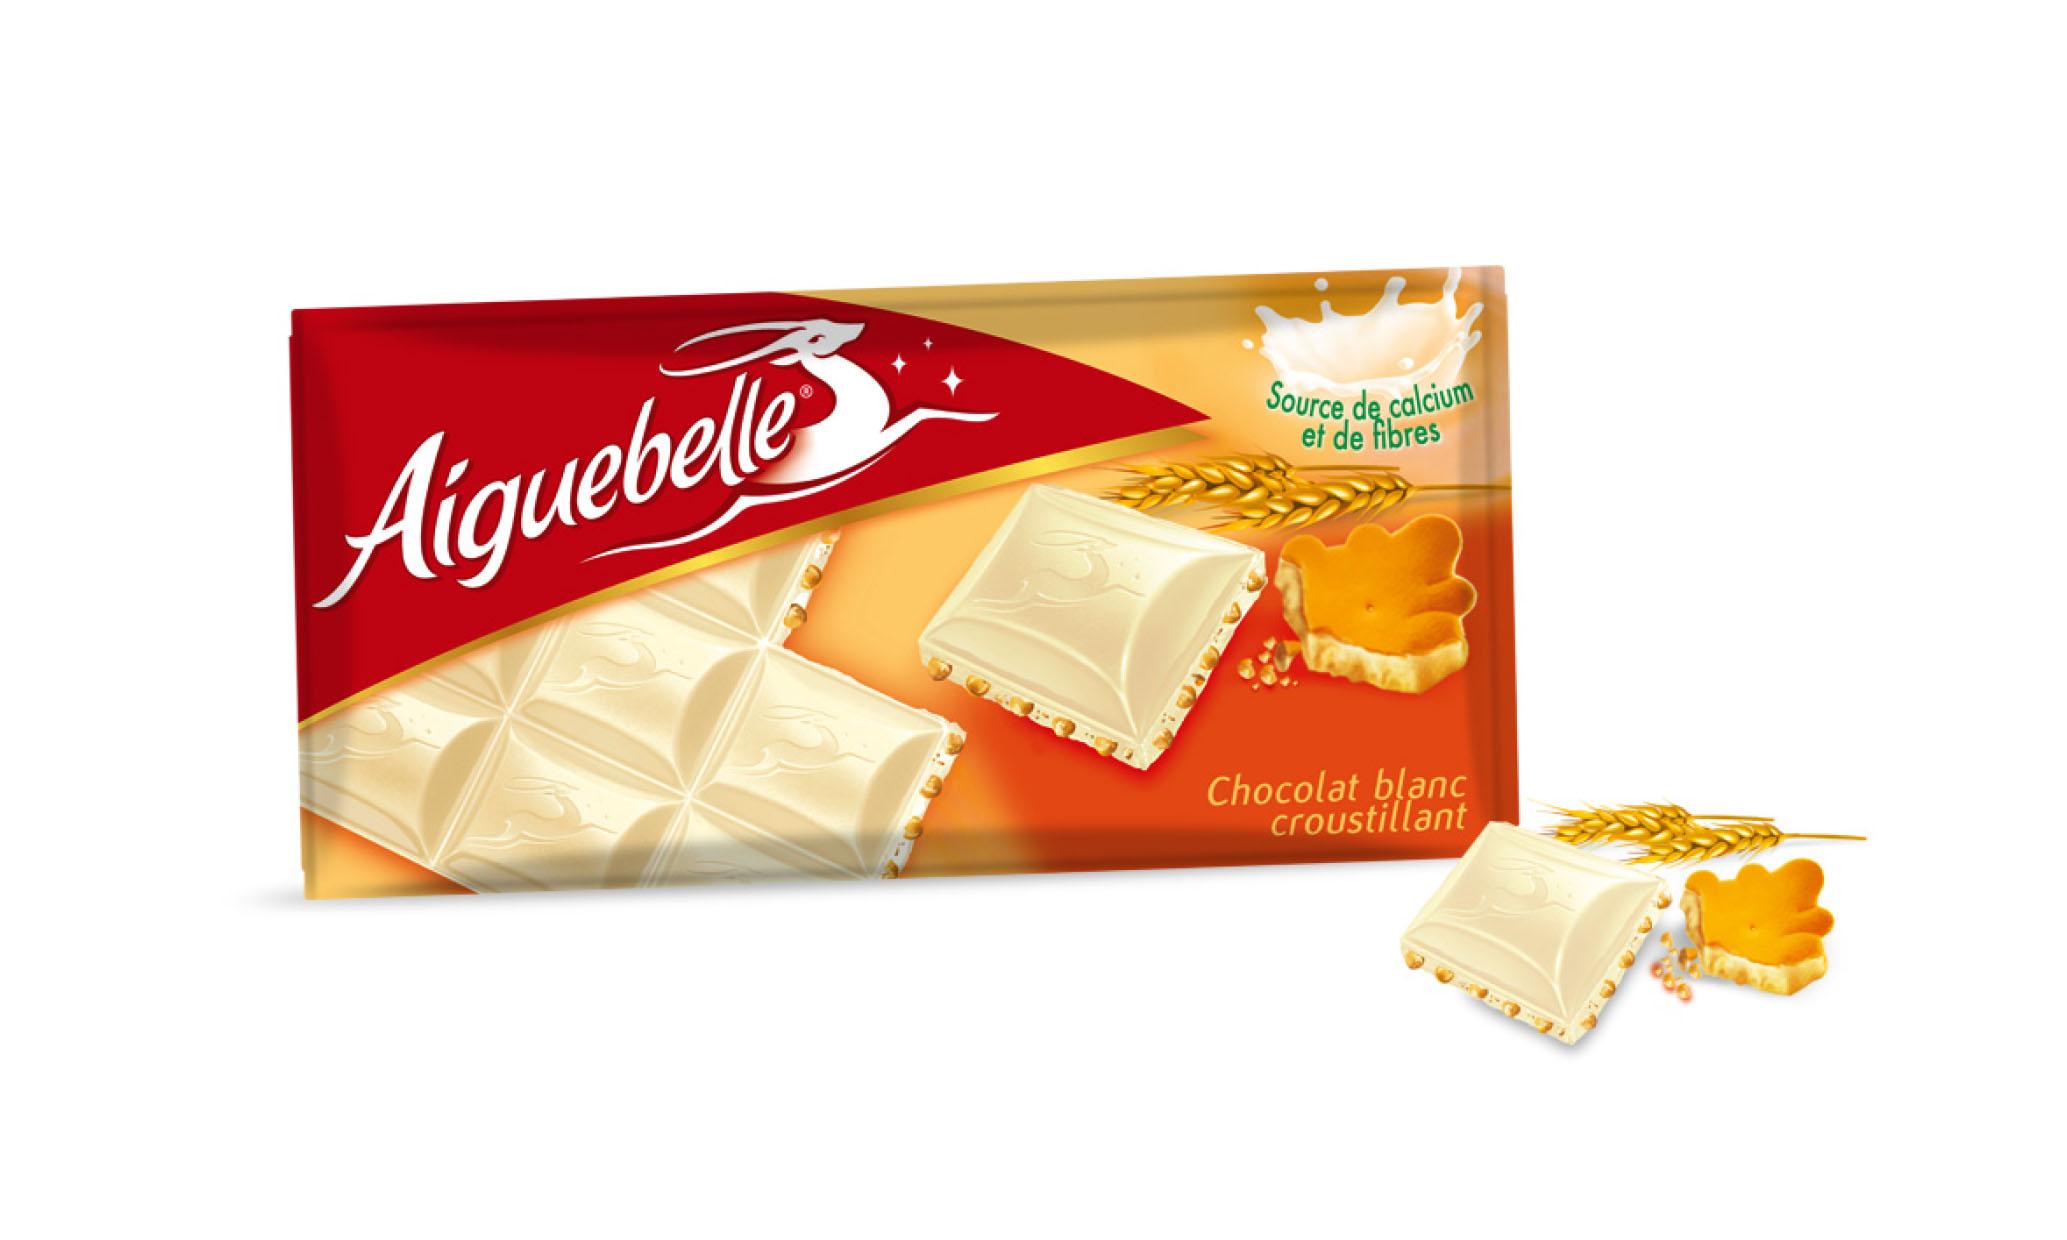 Packaging chocolat blanc croustillant Aiguebelle